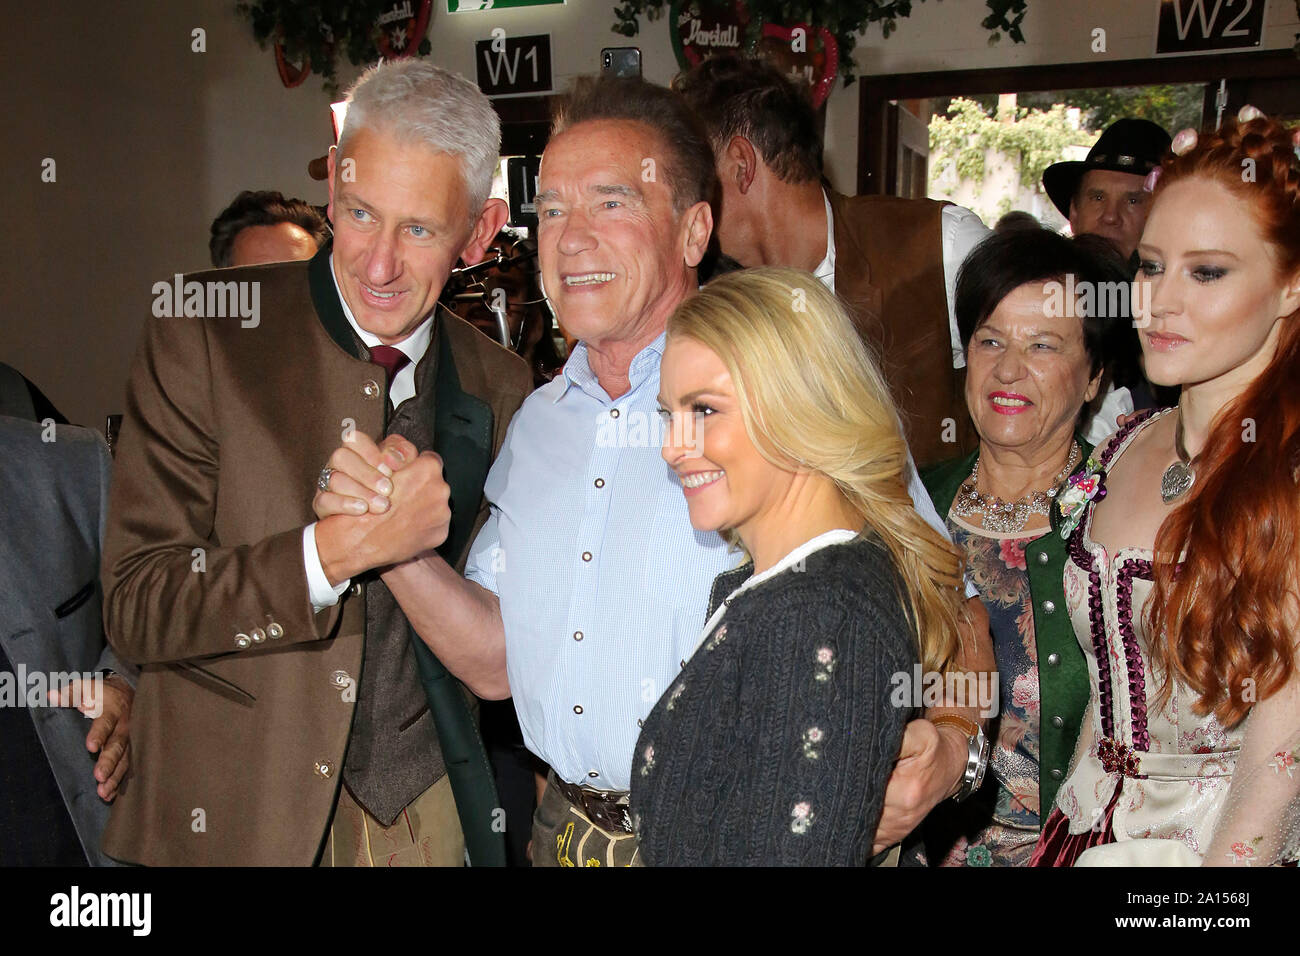 Munich, Deutschland. 22nd Sep, 2019. Siegfried Able and Arnold Schwarzenegger with girlfriend Heather Milligan at the Oktoberfest 2019 in the Marstall Festzelt. Munchen, 22.09.2019   usage worldwide Credit: dpa/Alamy Live News Stock Photo